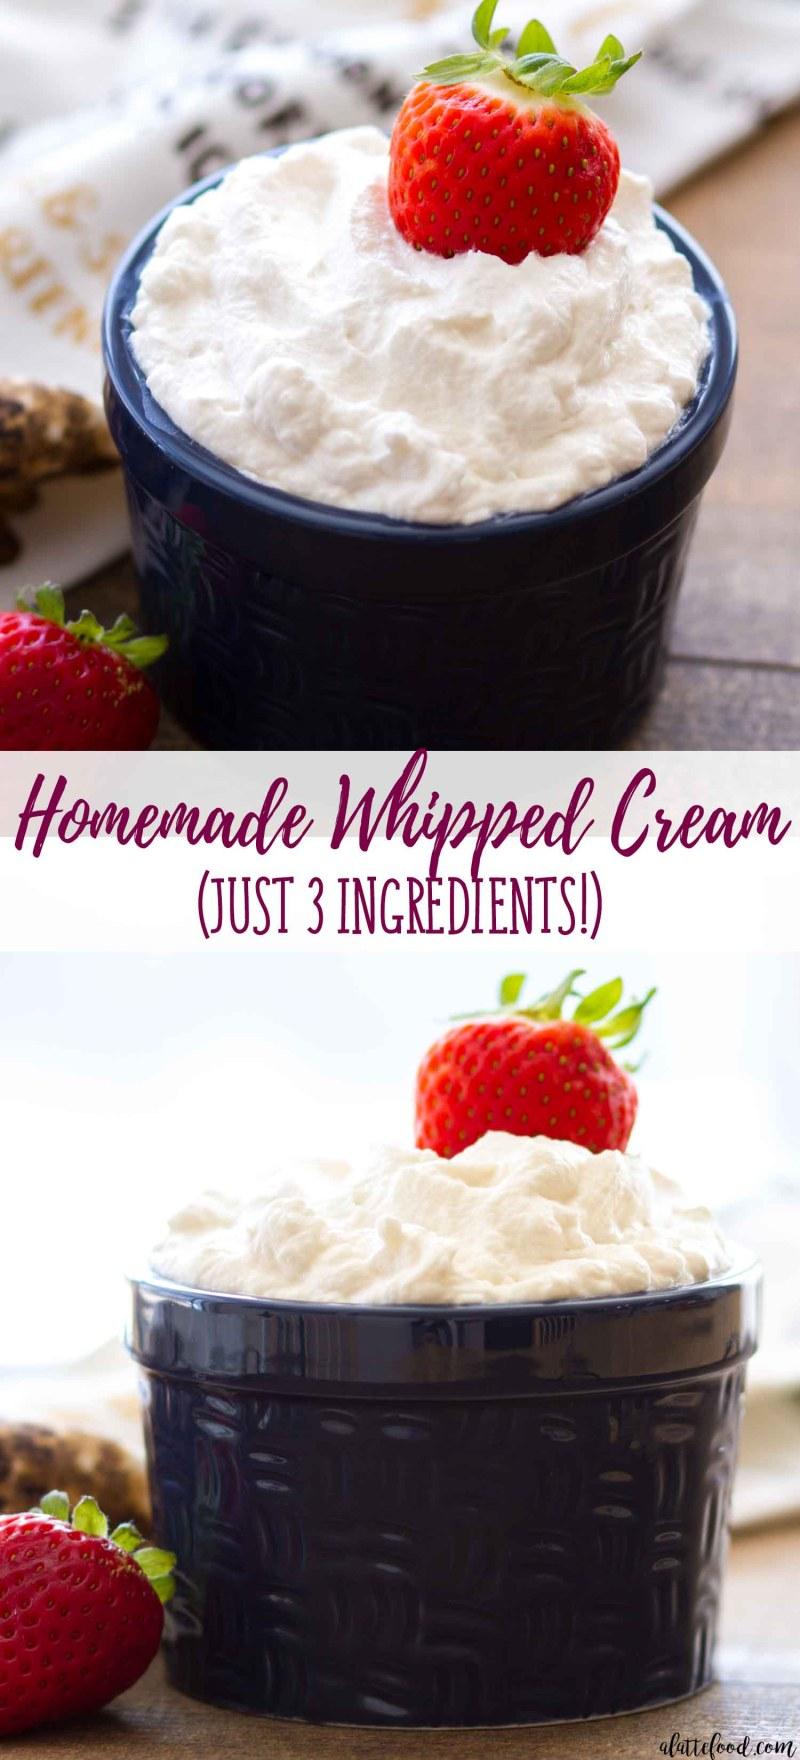 Homemade Whipped Cream Recipe